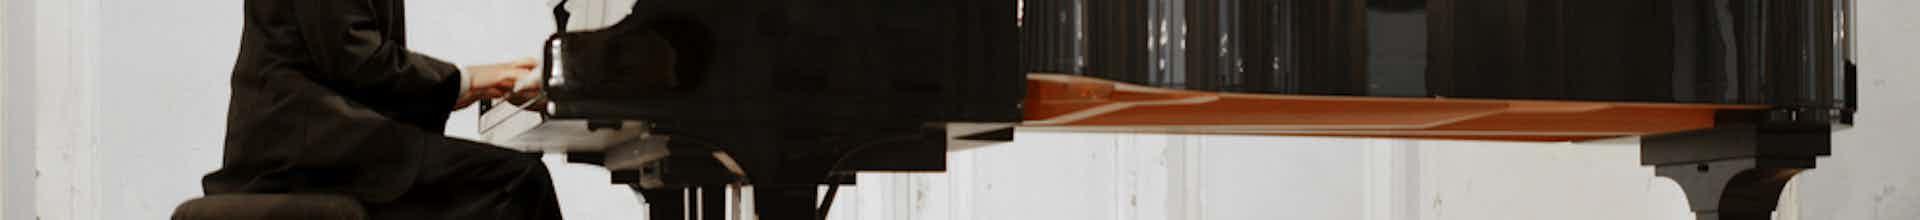 pianist-klassiek-vleugel